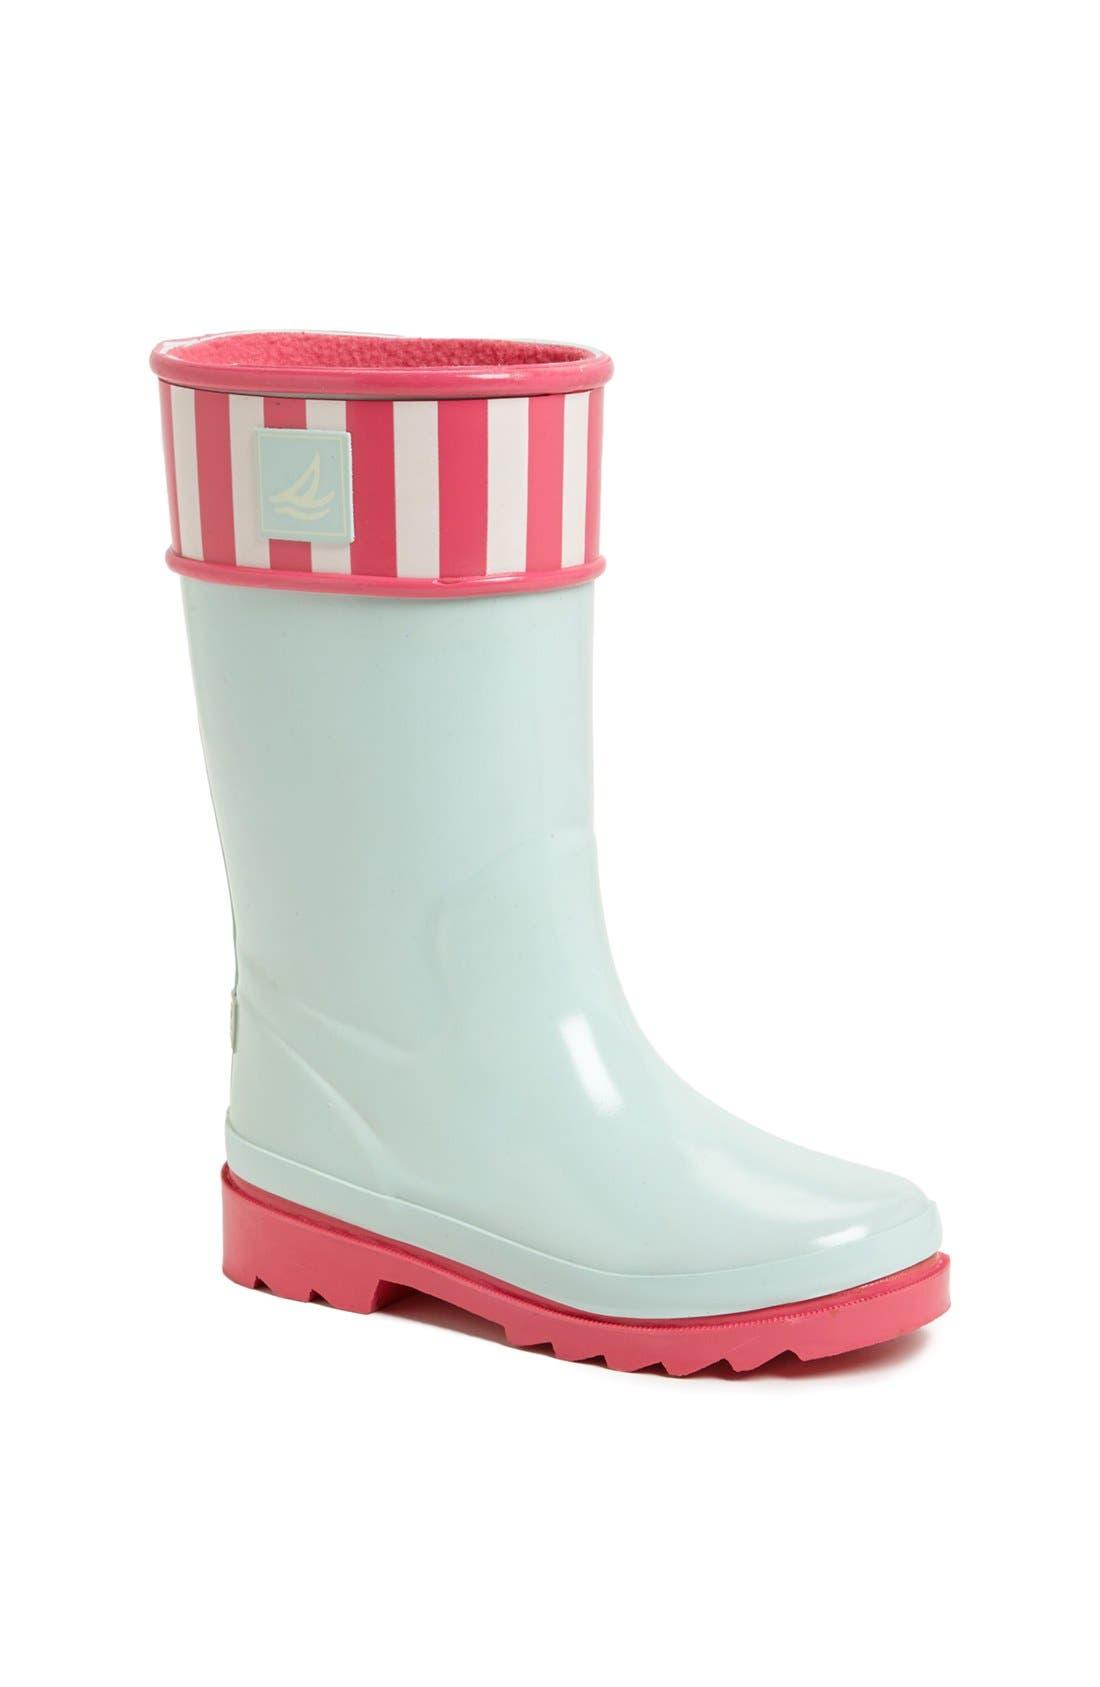 Main Image - Sperry Top-Sider® Kids 'Pelican' Rain Boot (Walker, Toddler, Little Kid & Big Kid)